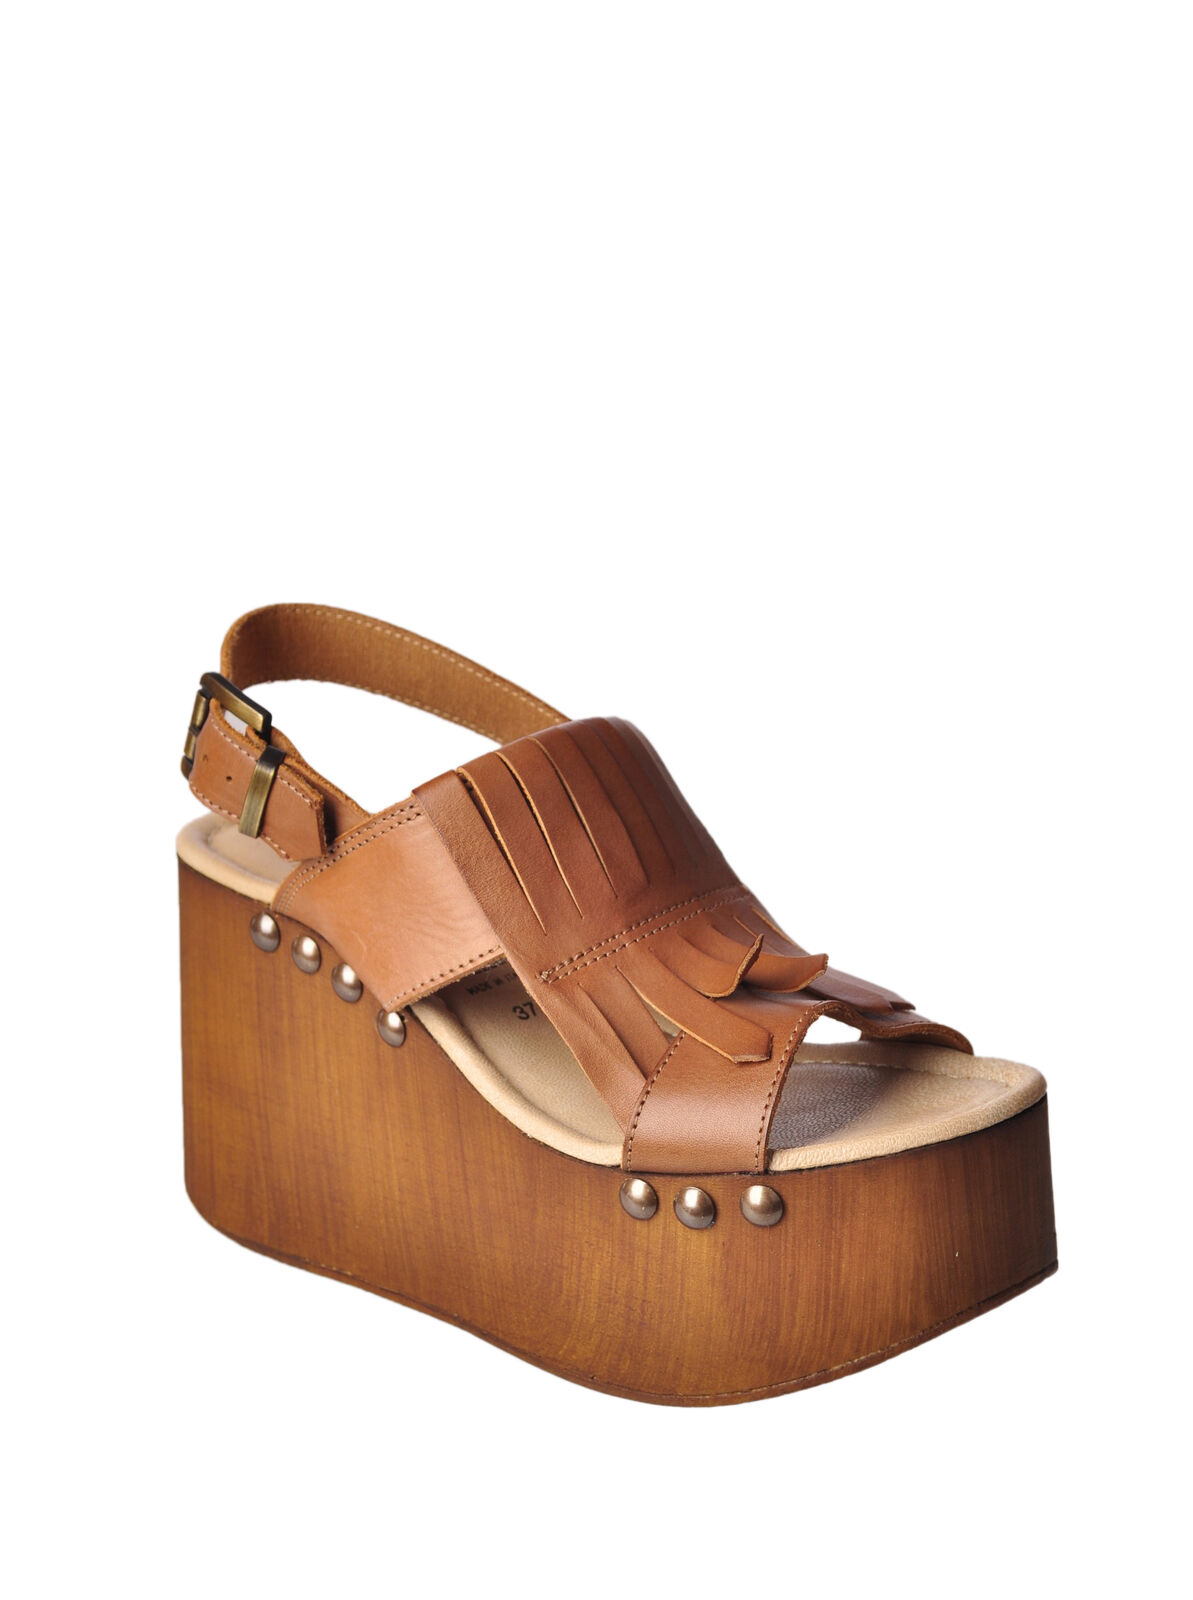 UnLace  -  Sandals - Female - Beige - 1903812A184208